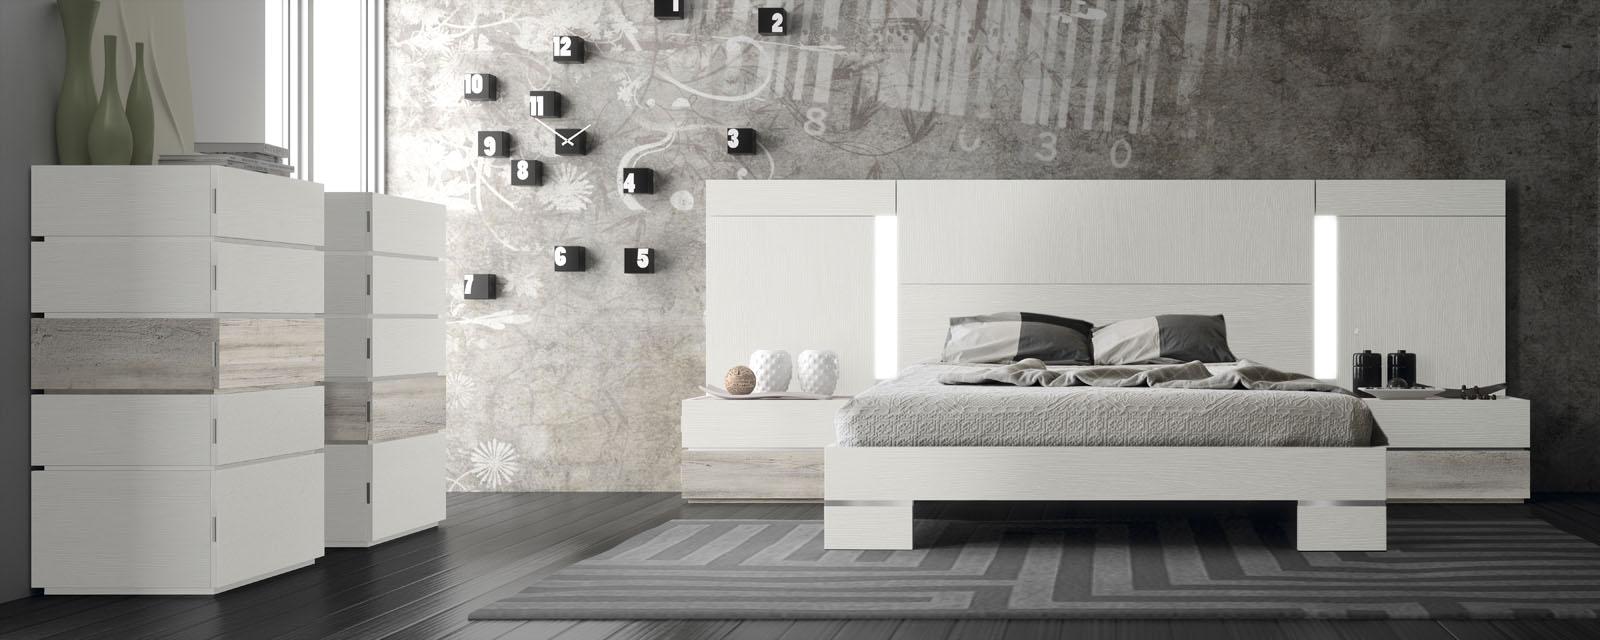 Dormitorio Matrimonio Mueblesparra Com # Muebles Sipo Armarios